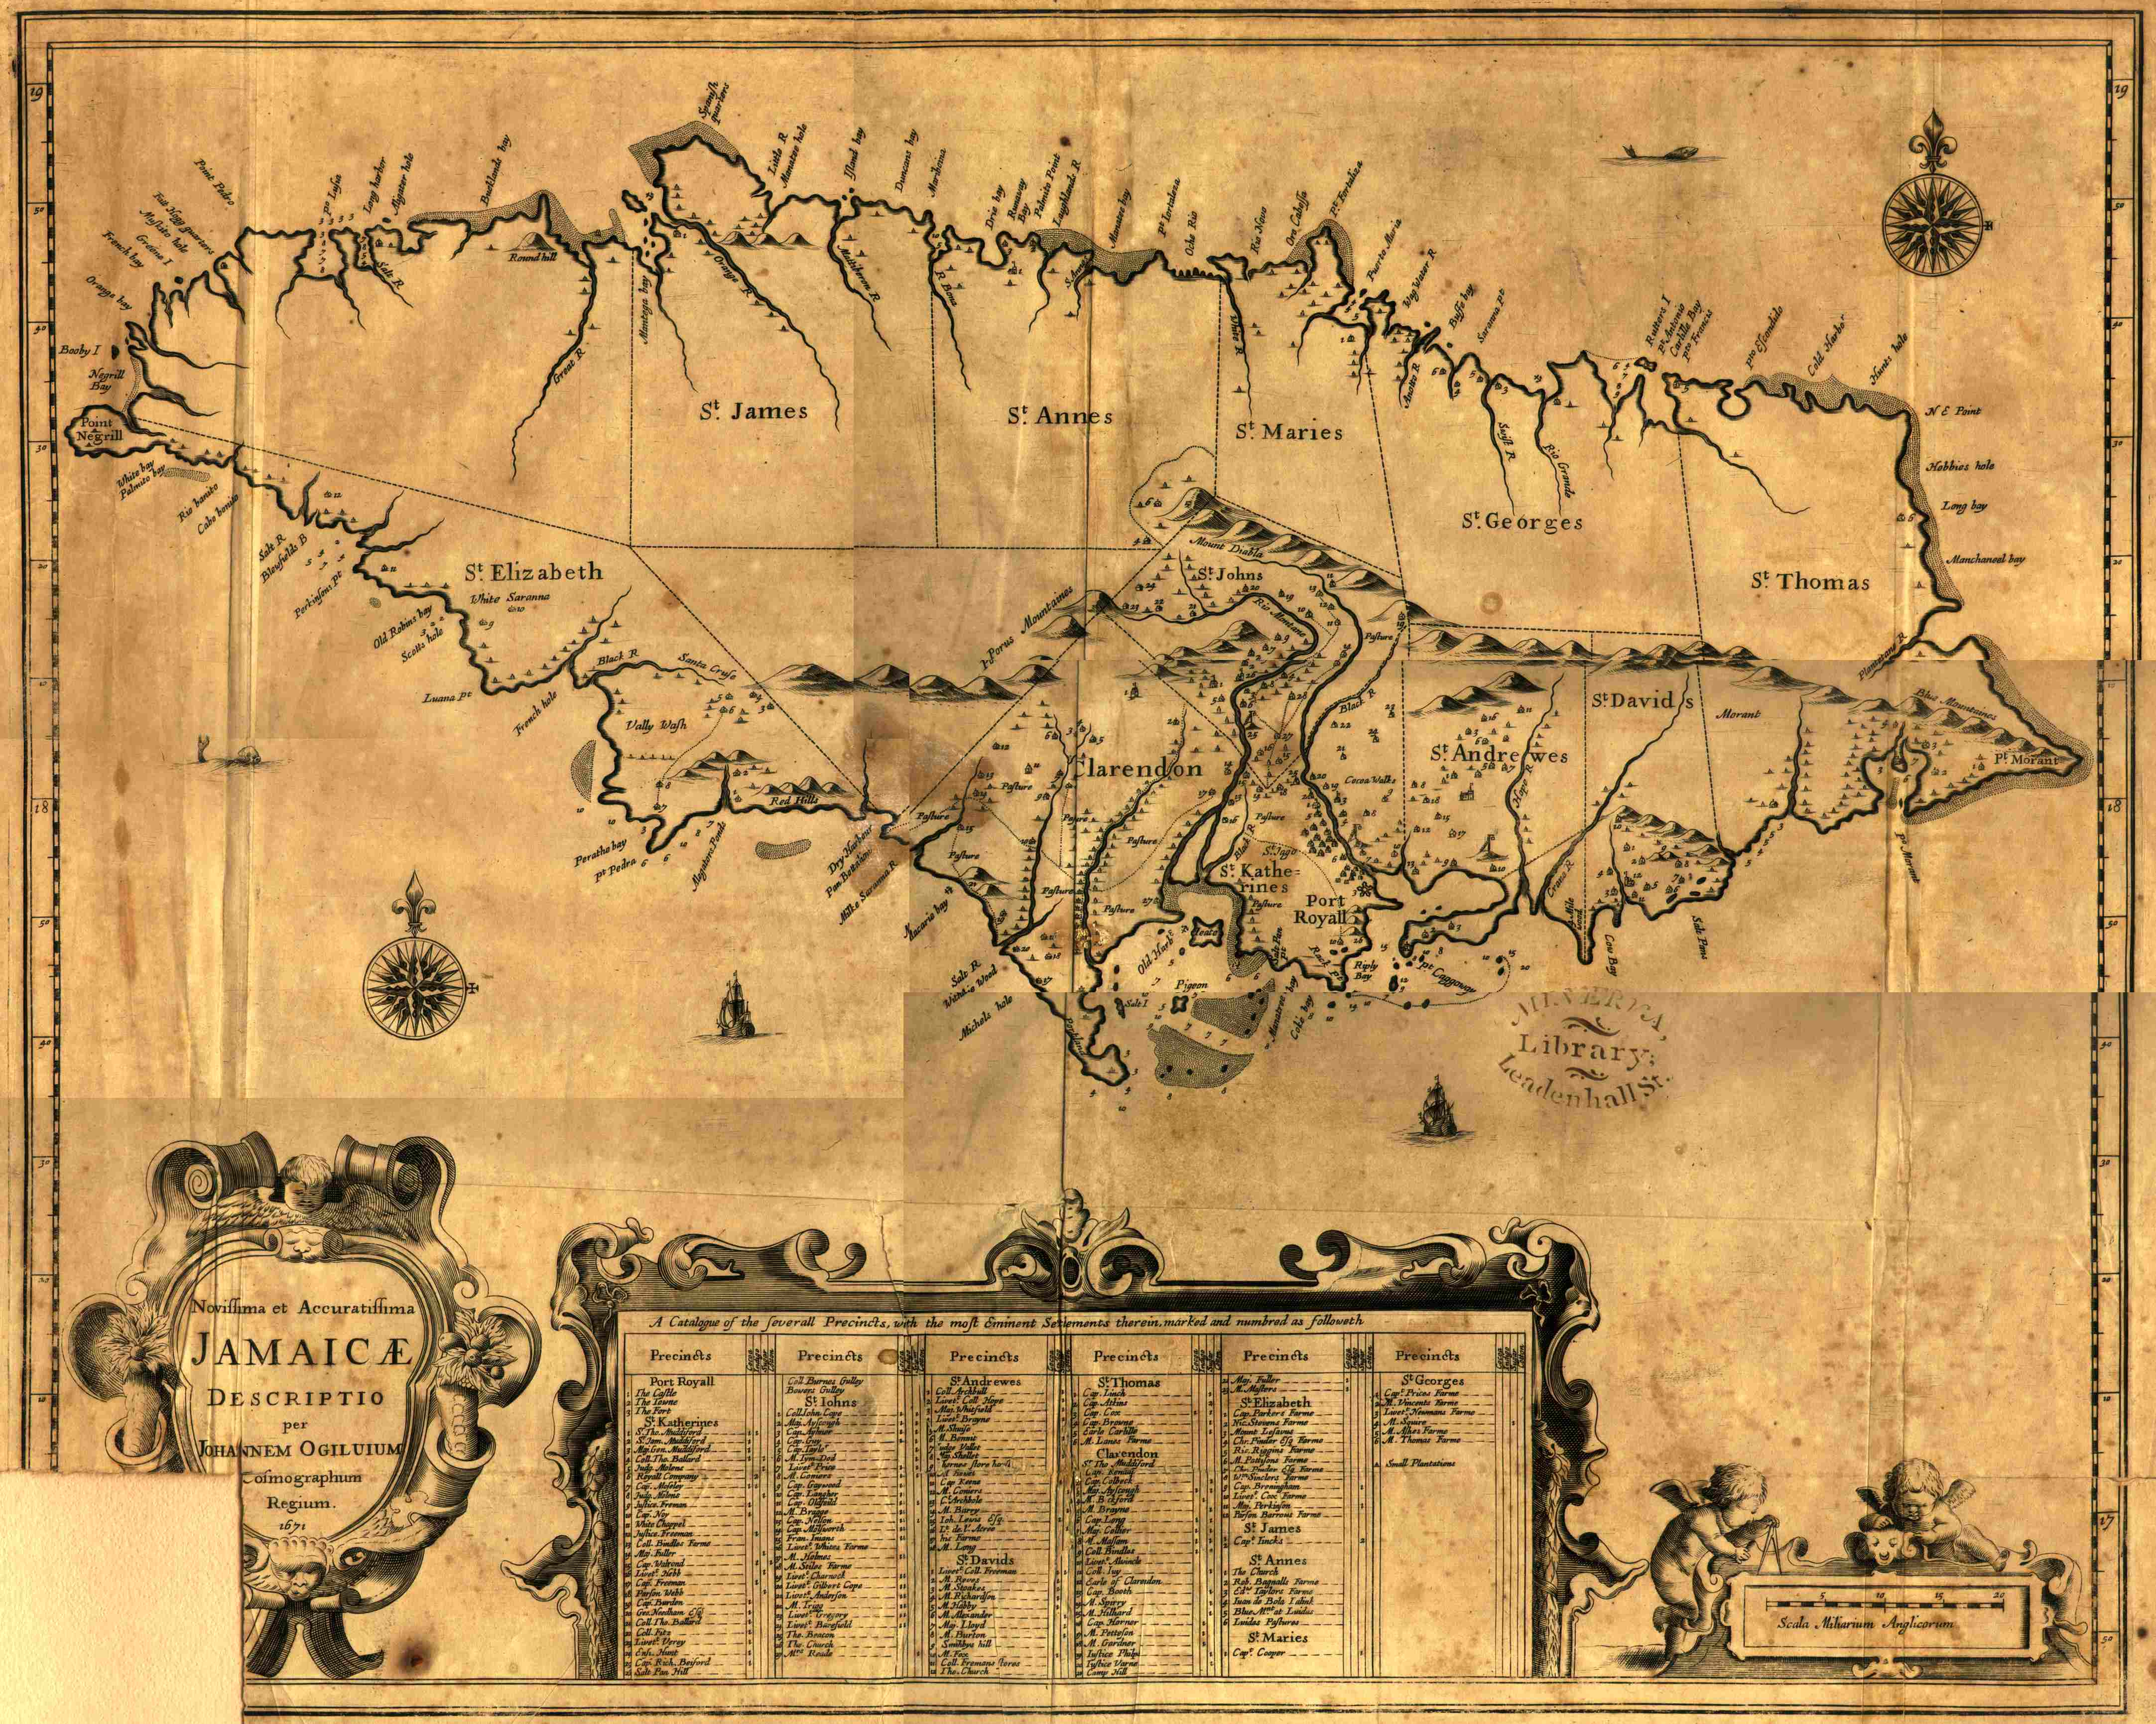 Invasion of Jamaica - Wikipedia